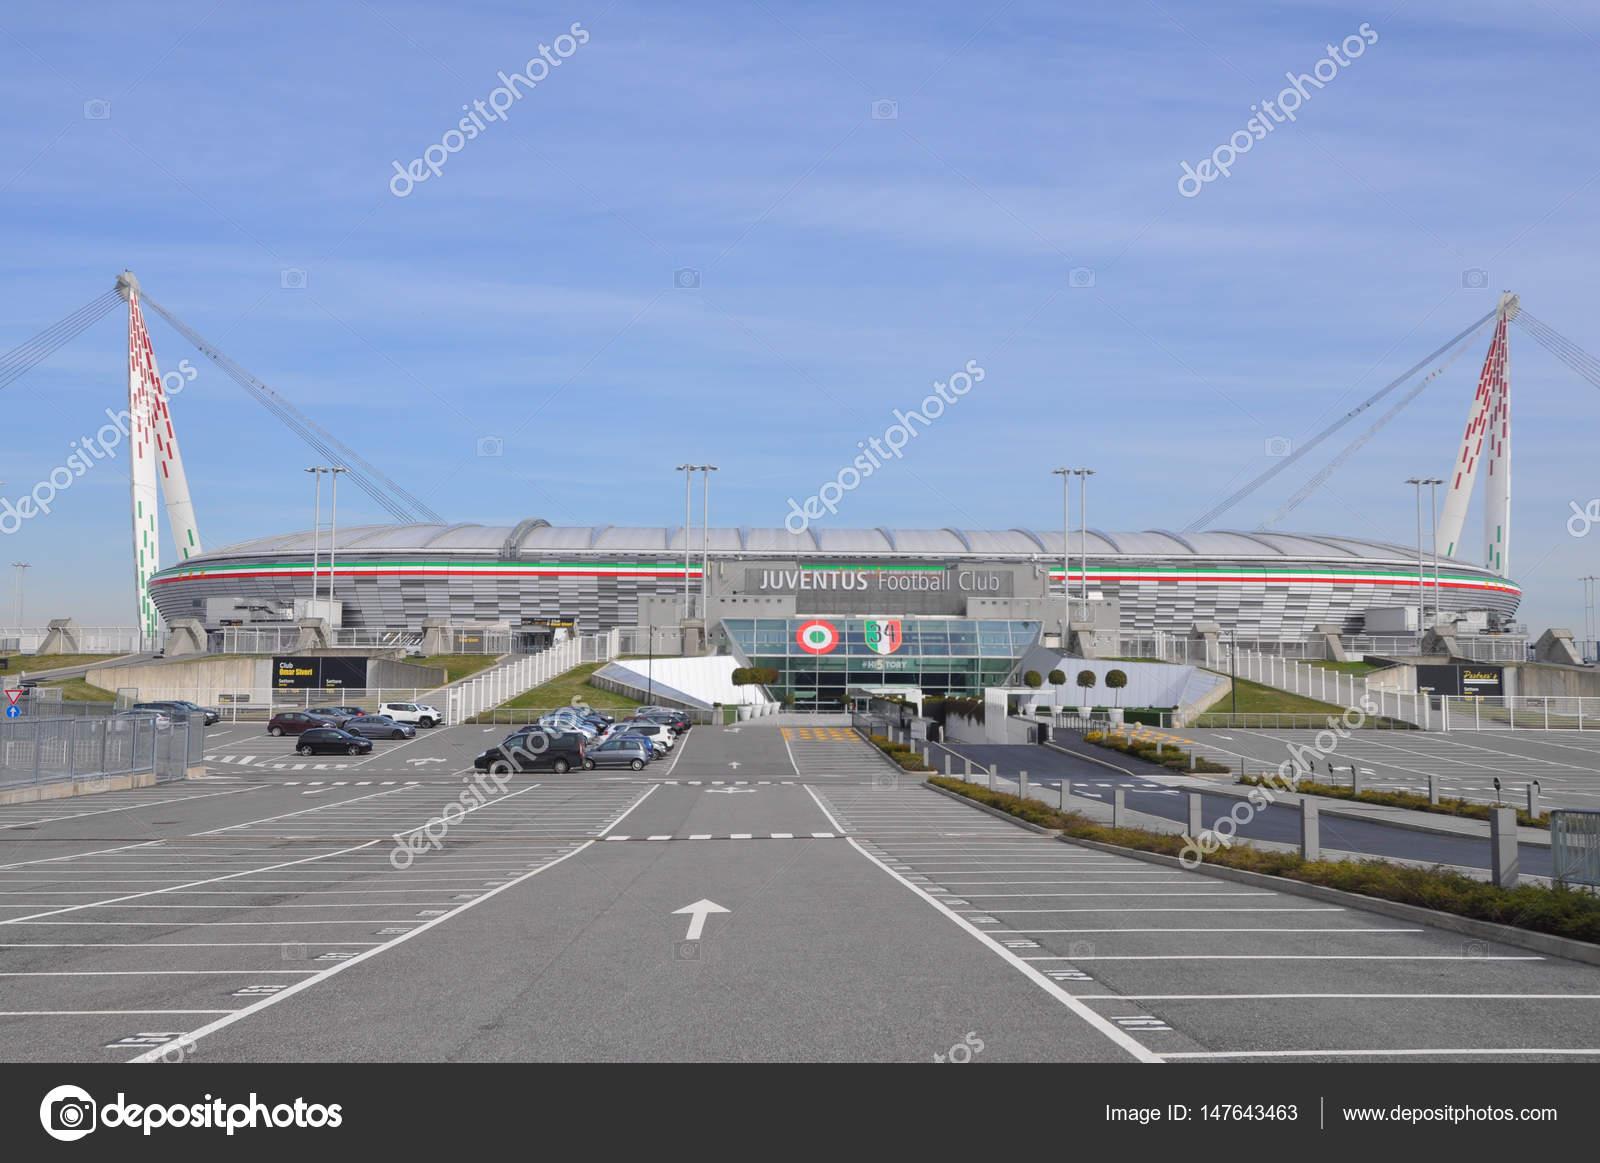 juventus stadium in turin stock editorial photo c scrisman 147643463 https depositphotos com 147643463 stock photo juventus stadium in turin html